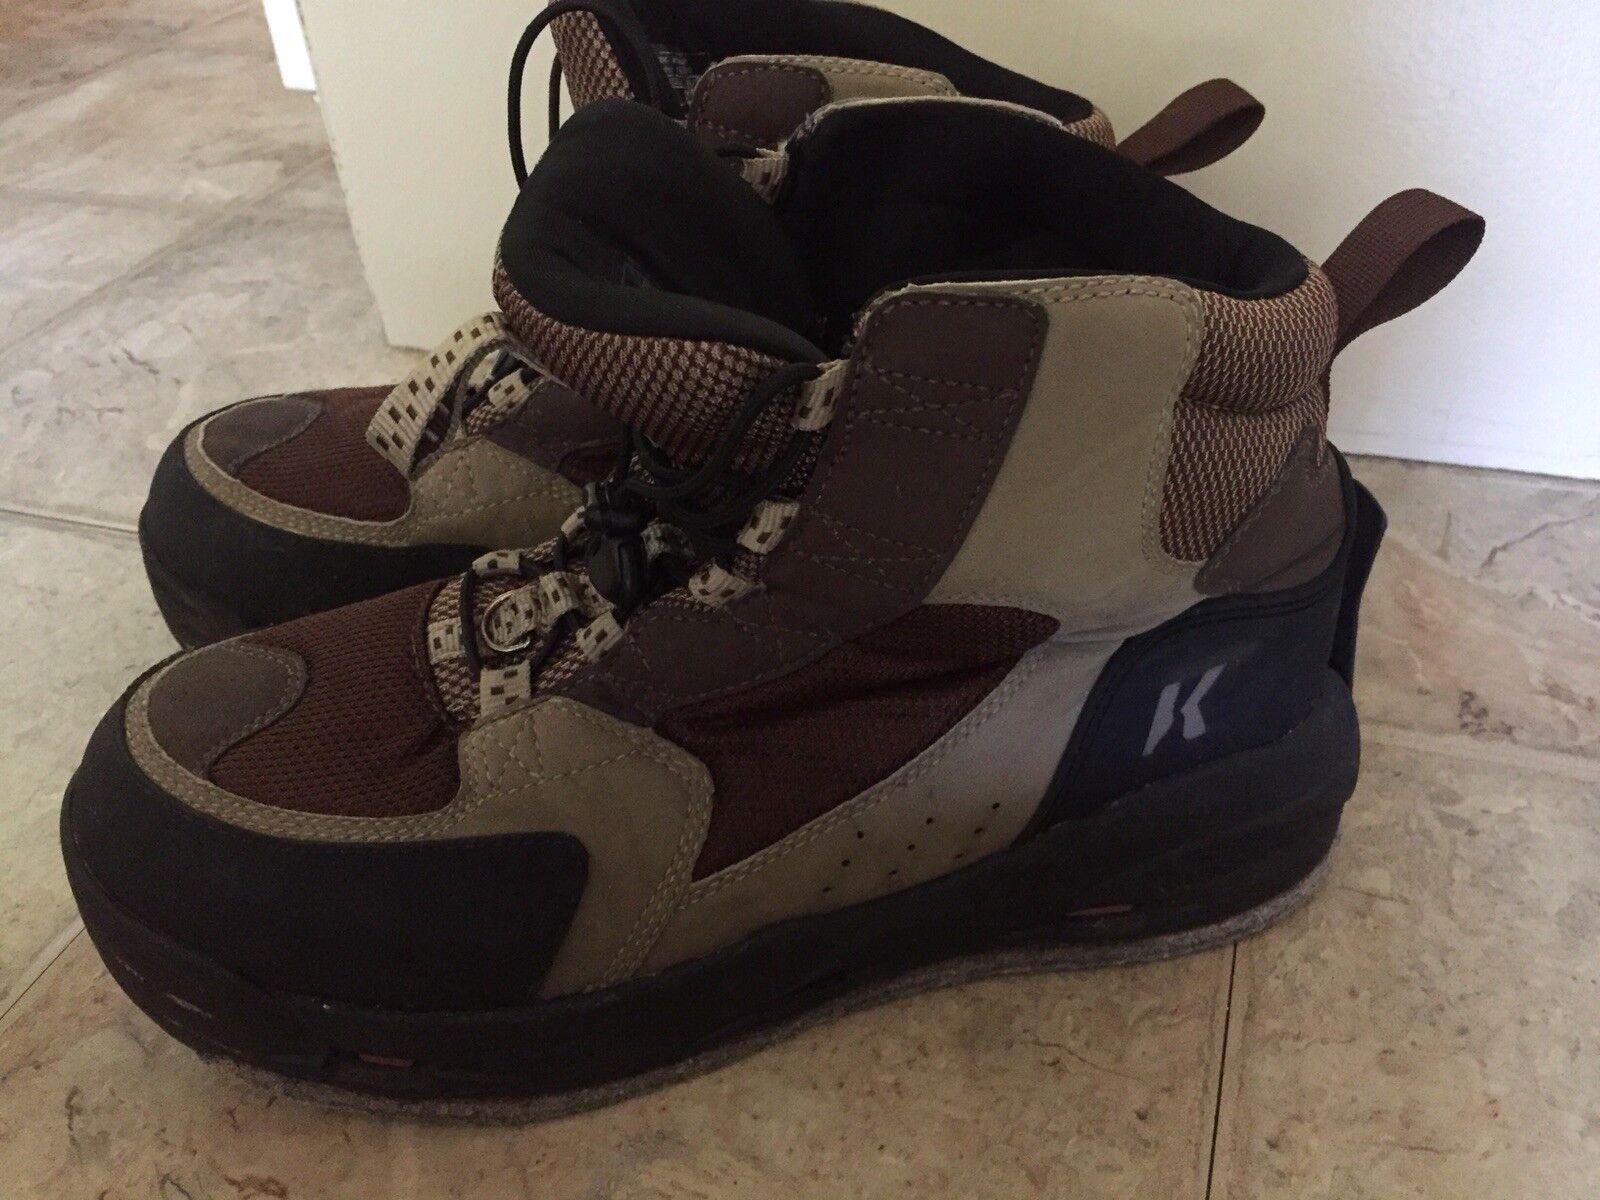 Kortex Omnitrax Redside Men's Boots Size 13 Felt Sole Interchangable